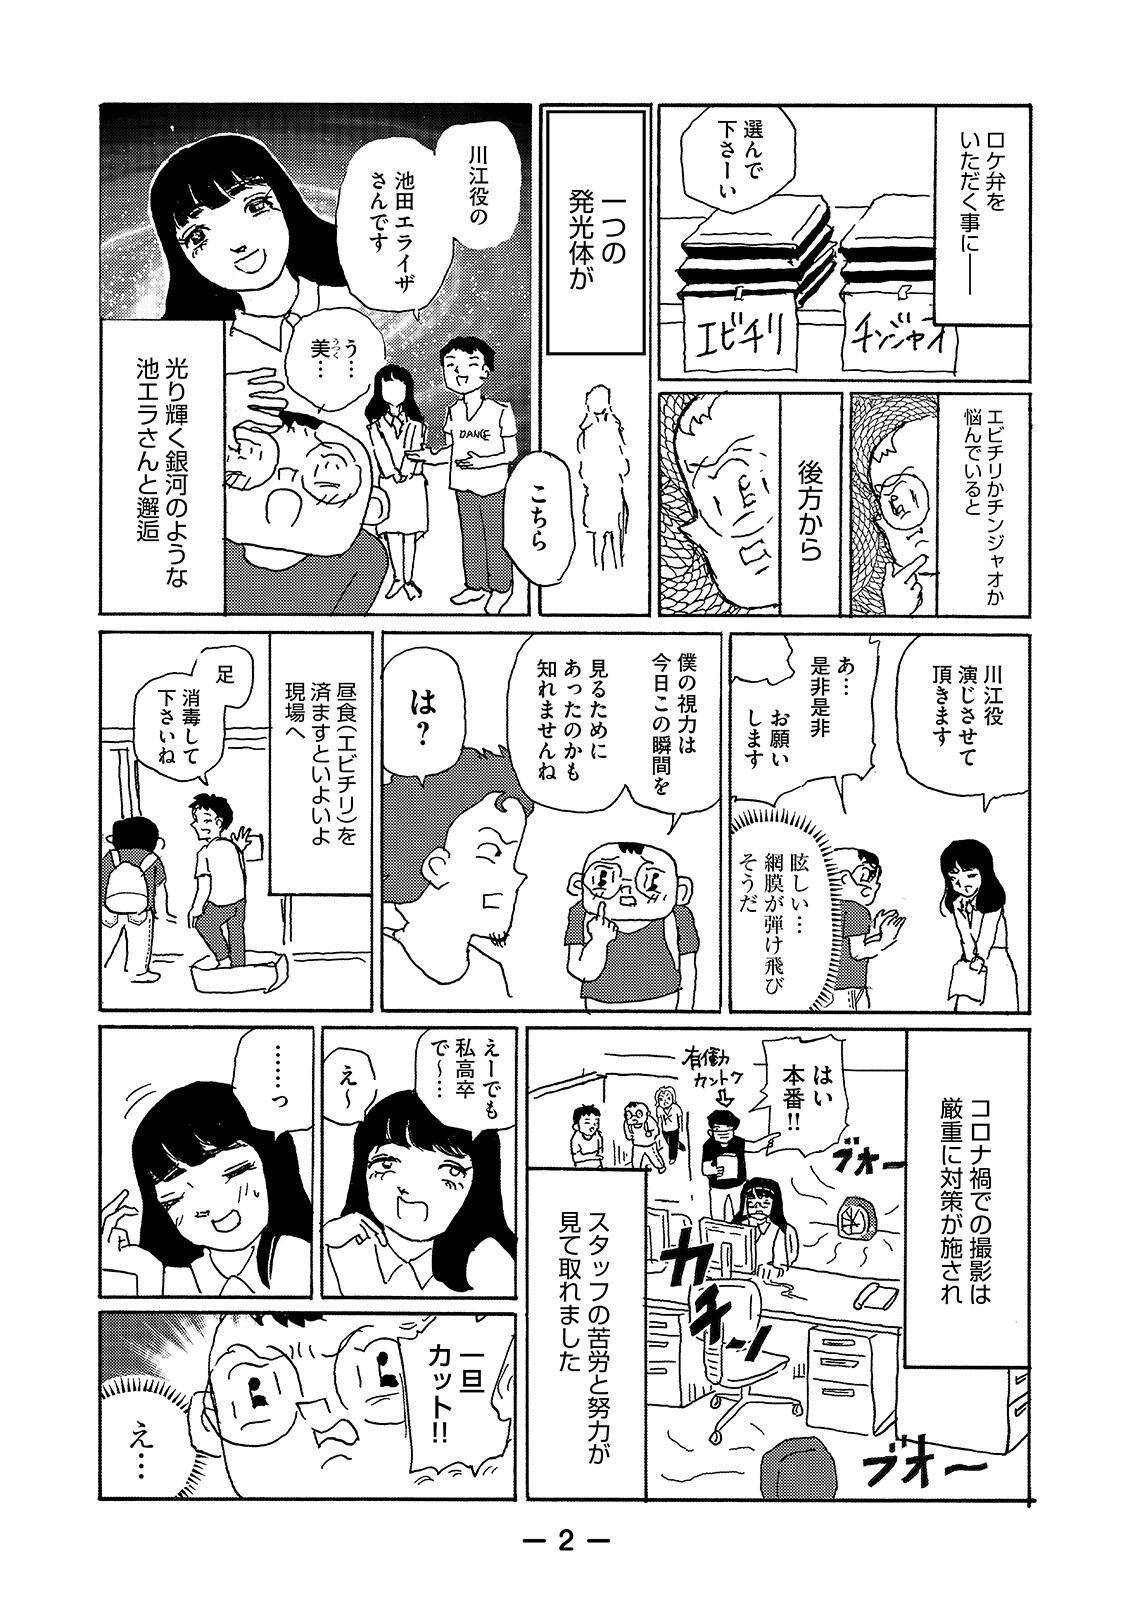 20200821_hatarakazaru_03.jpg